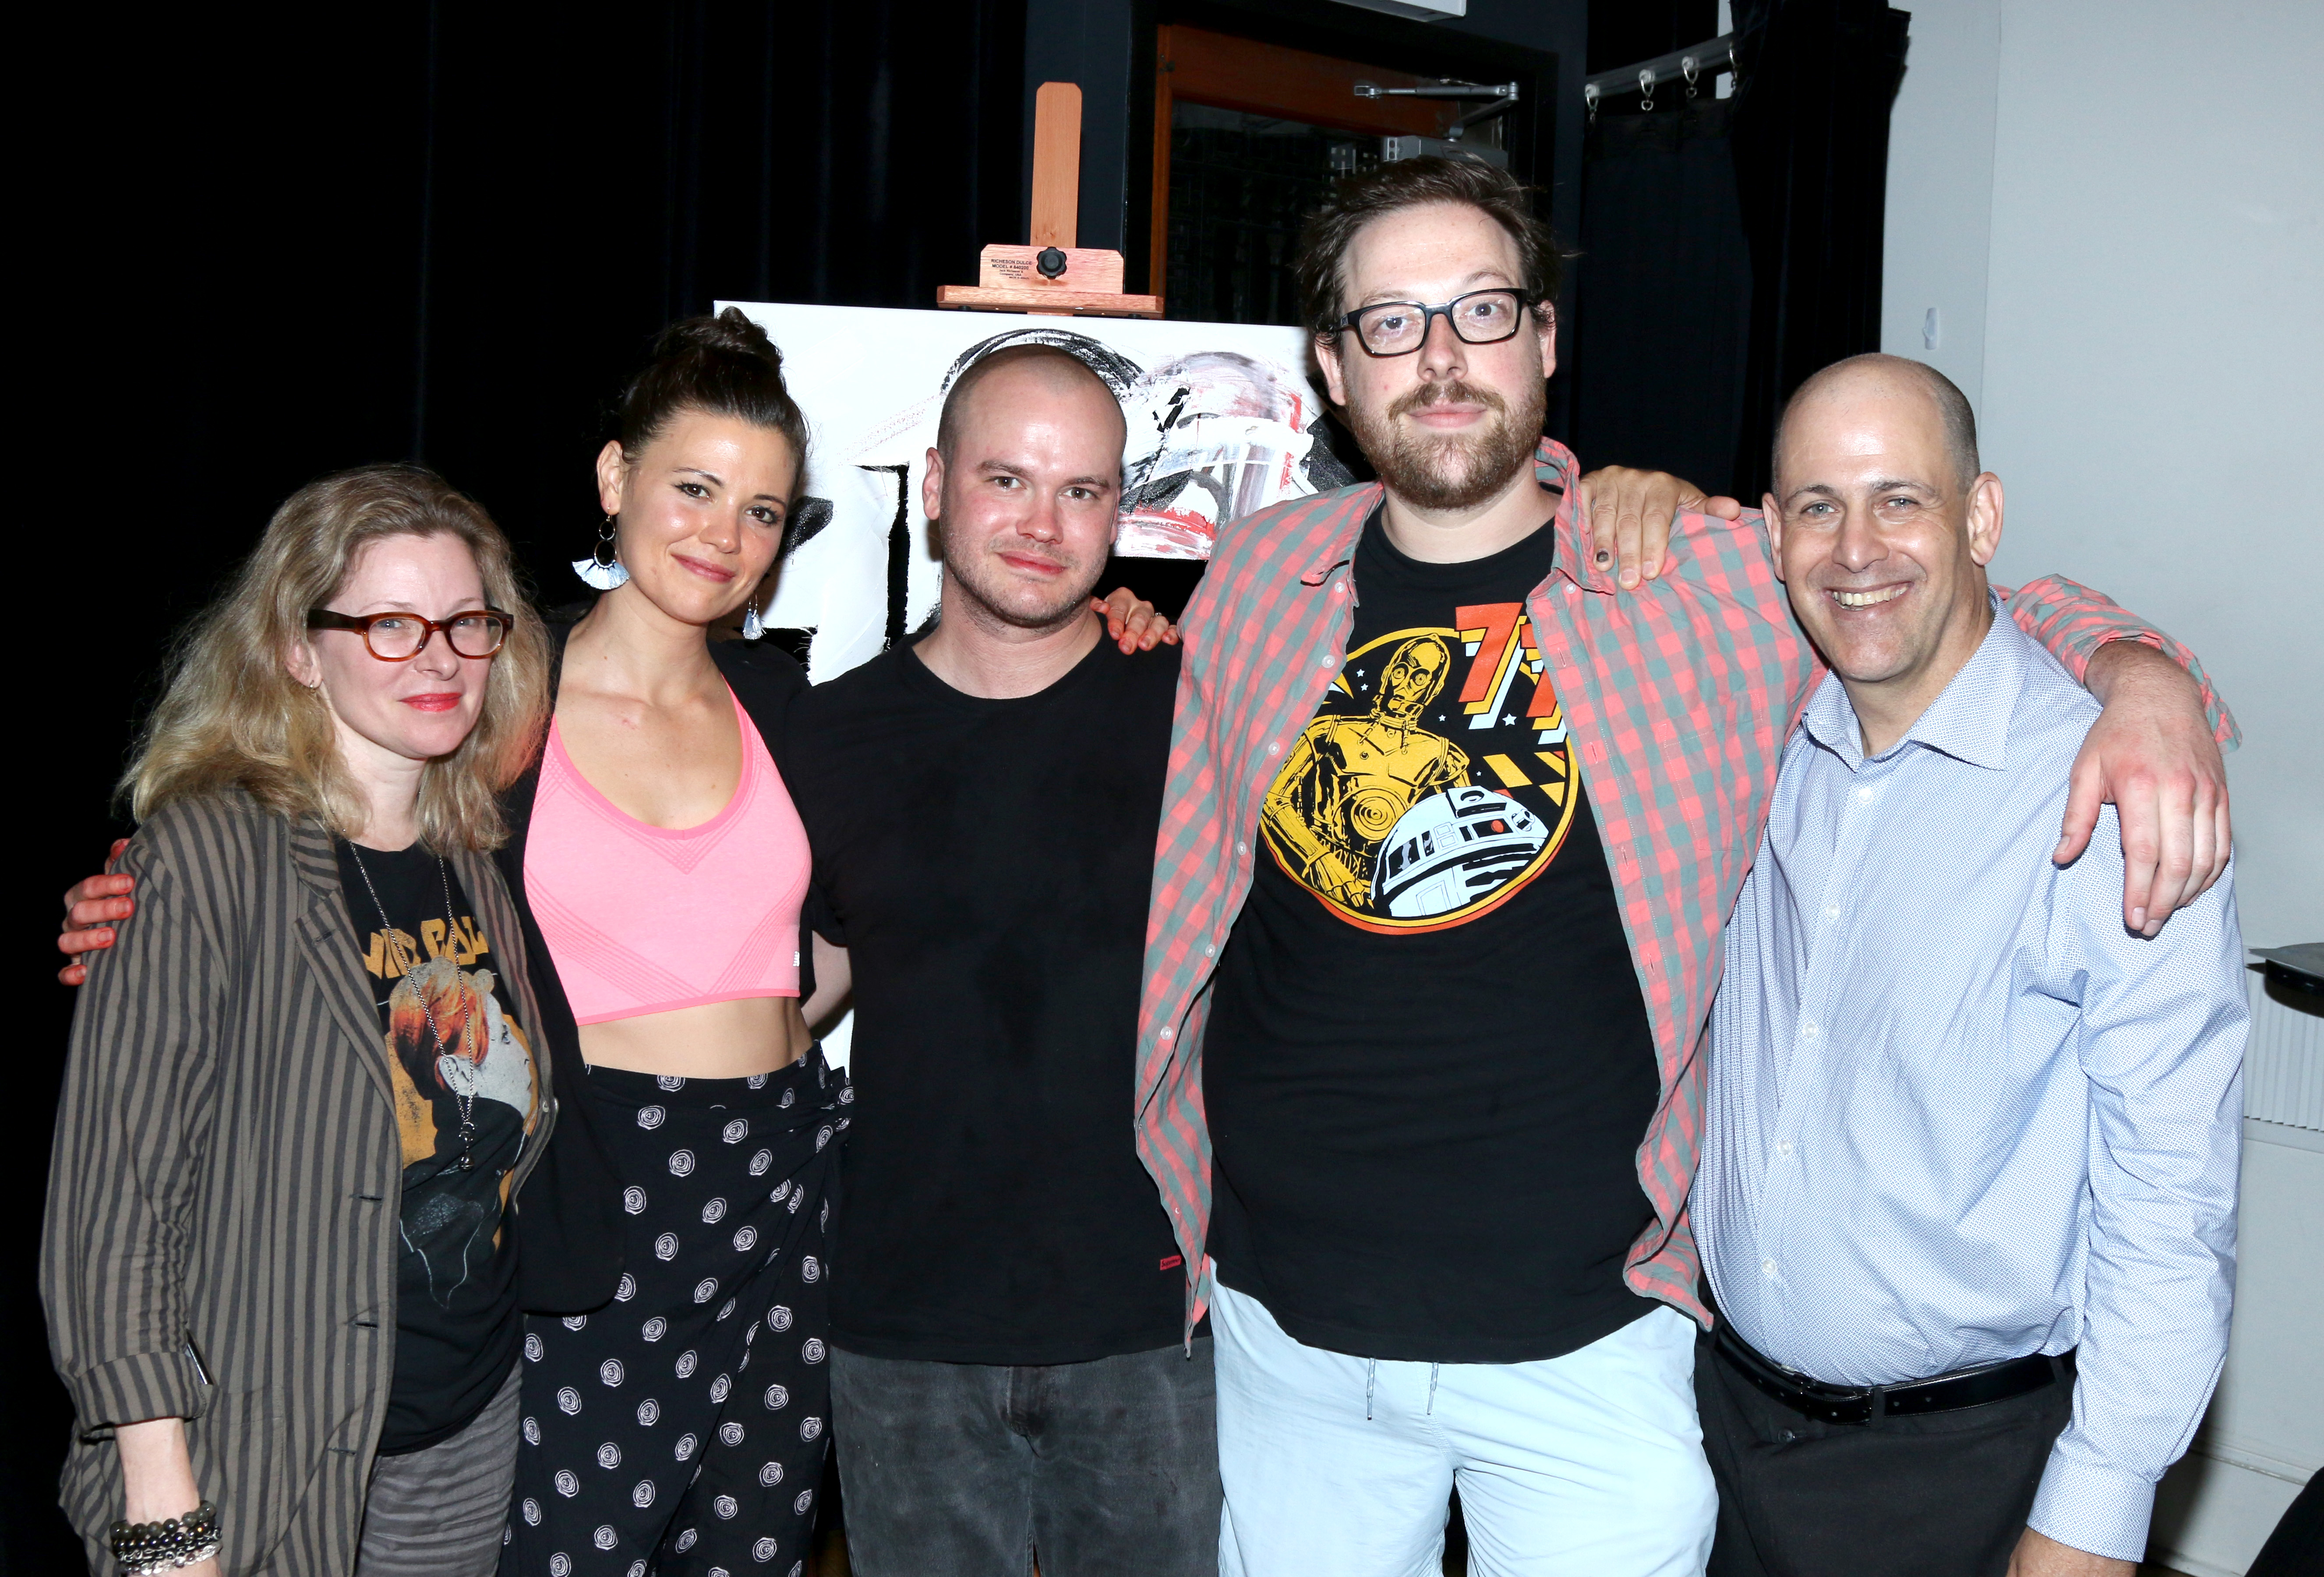 Director Cady McClain with actors Meredith Garretson, Stephen Louis Grush, David Lanson, and playwri